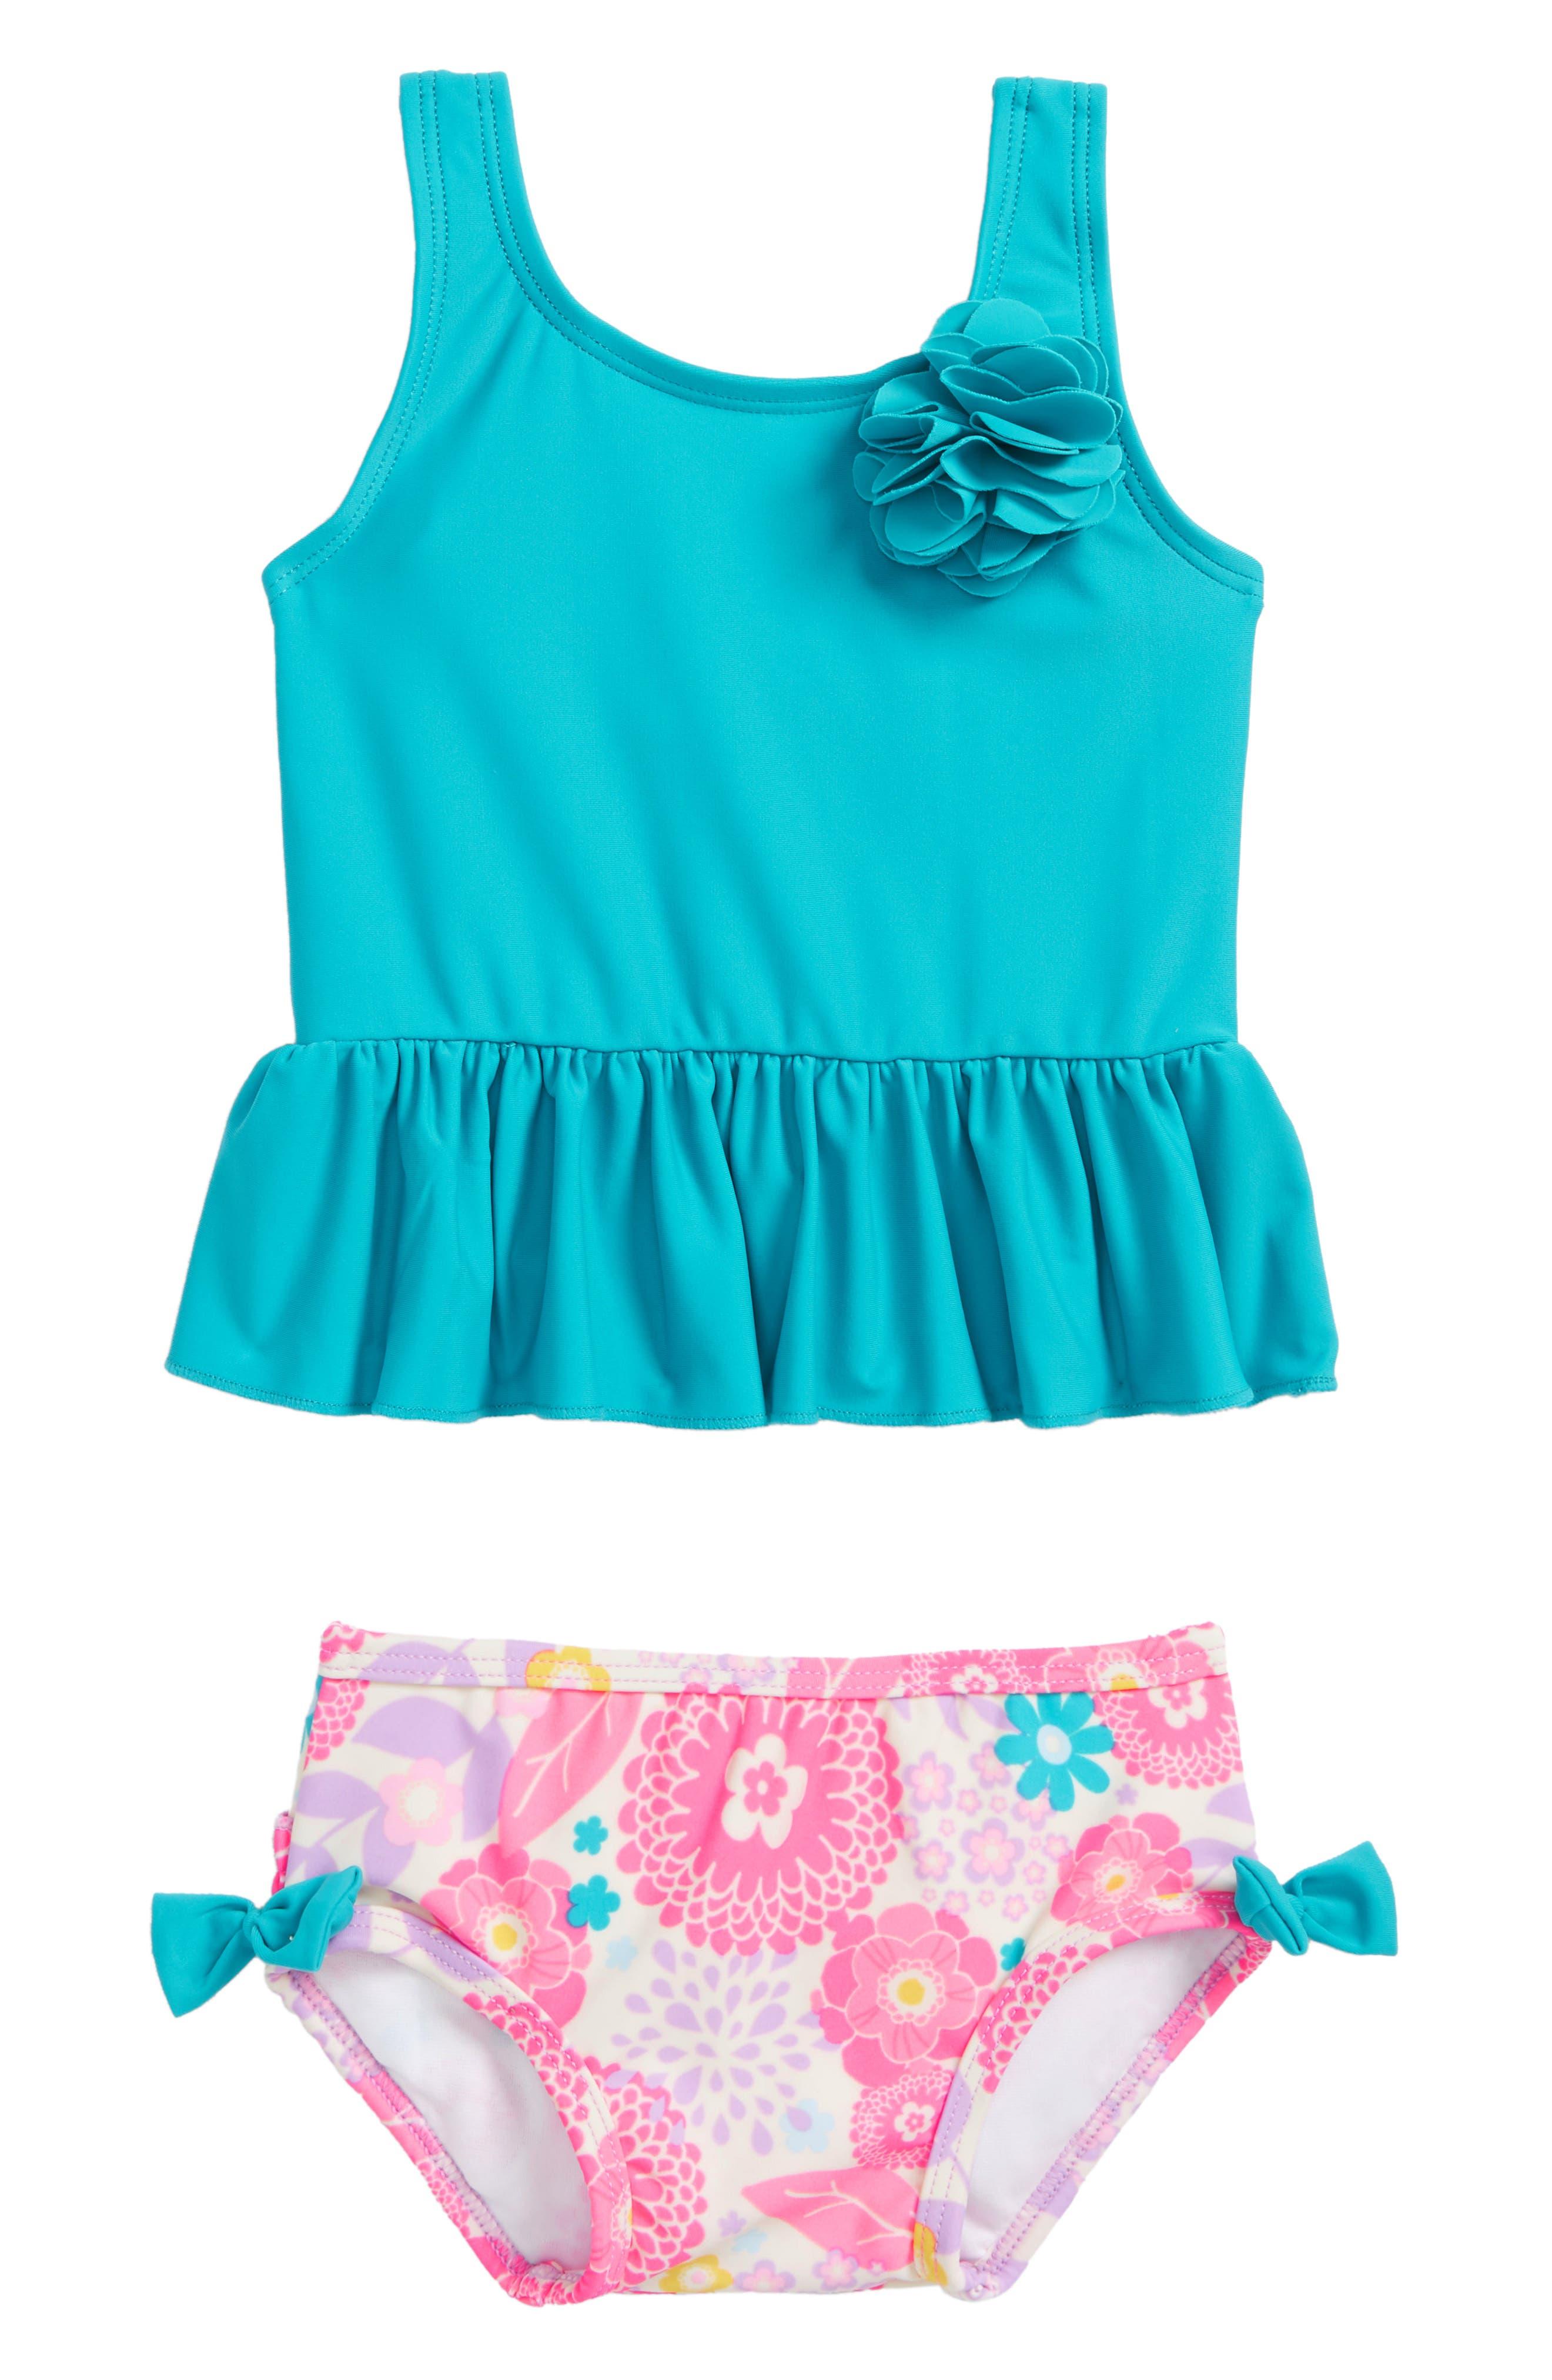 RuffleButts Blooming Peplum Two-Piece Swimsuit (Baby Girls)